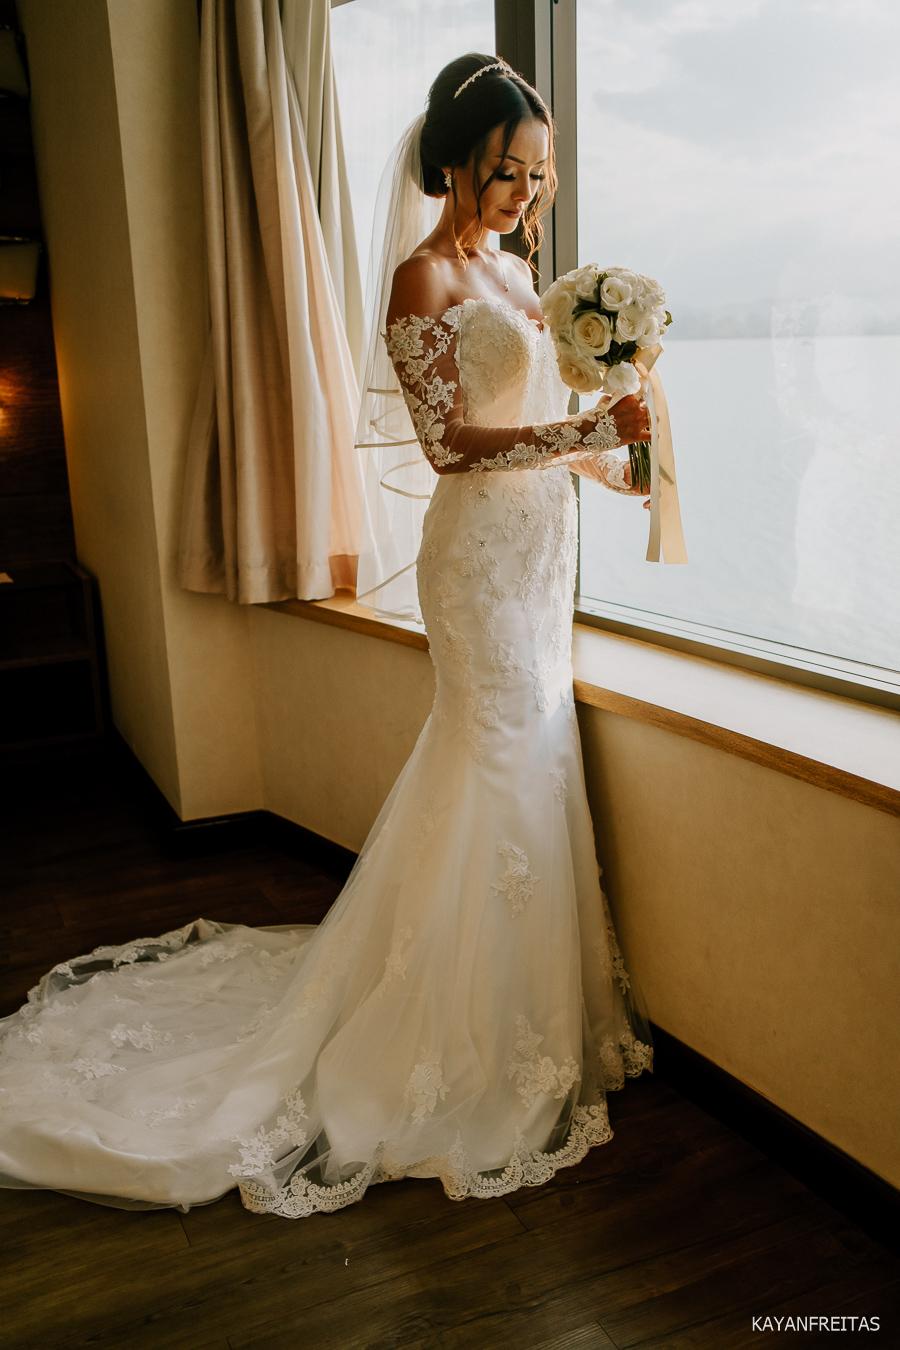 casamento-indaia-floripa-0027 Casamento Indaiá Florianópolis - Deise e Dário